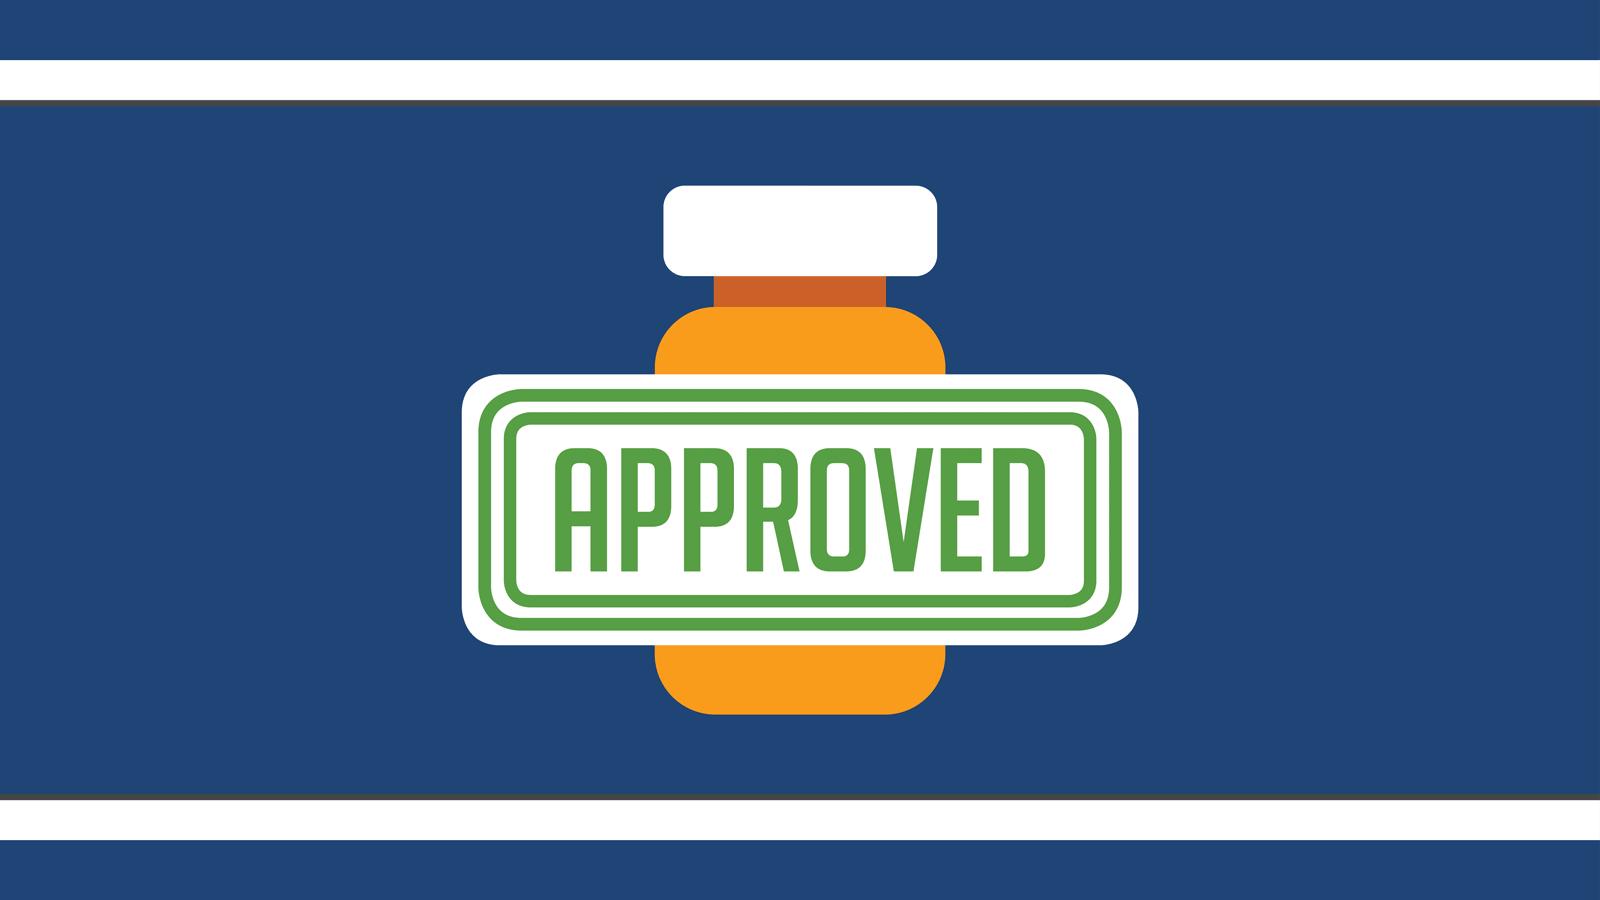 FDA Approves Generic Latuda for Schizophrenia and Bipolar Depression